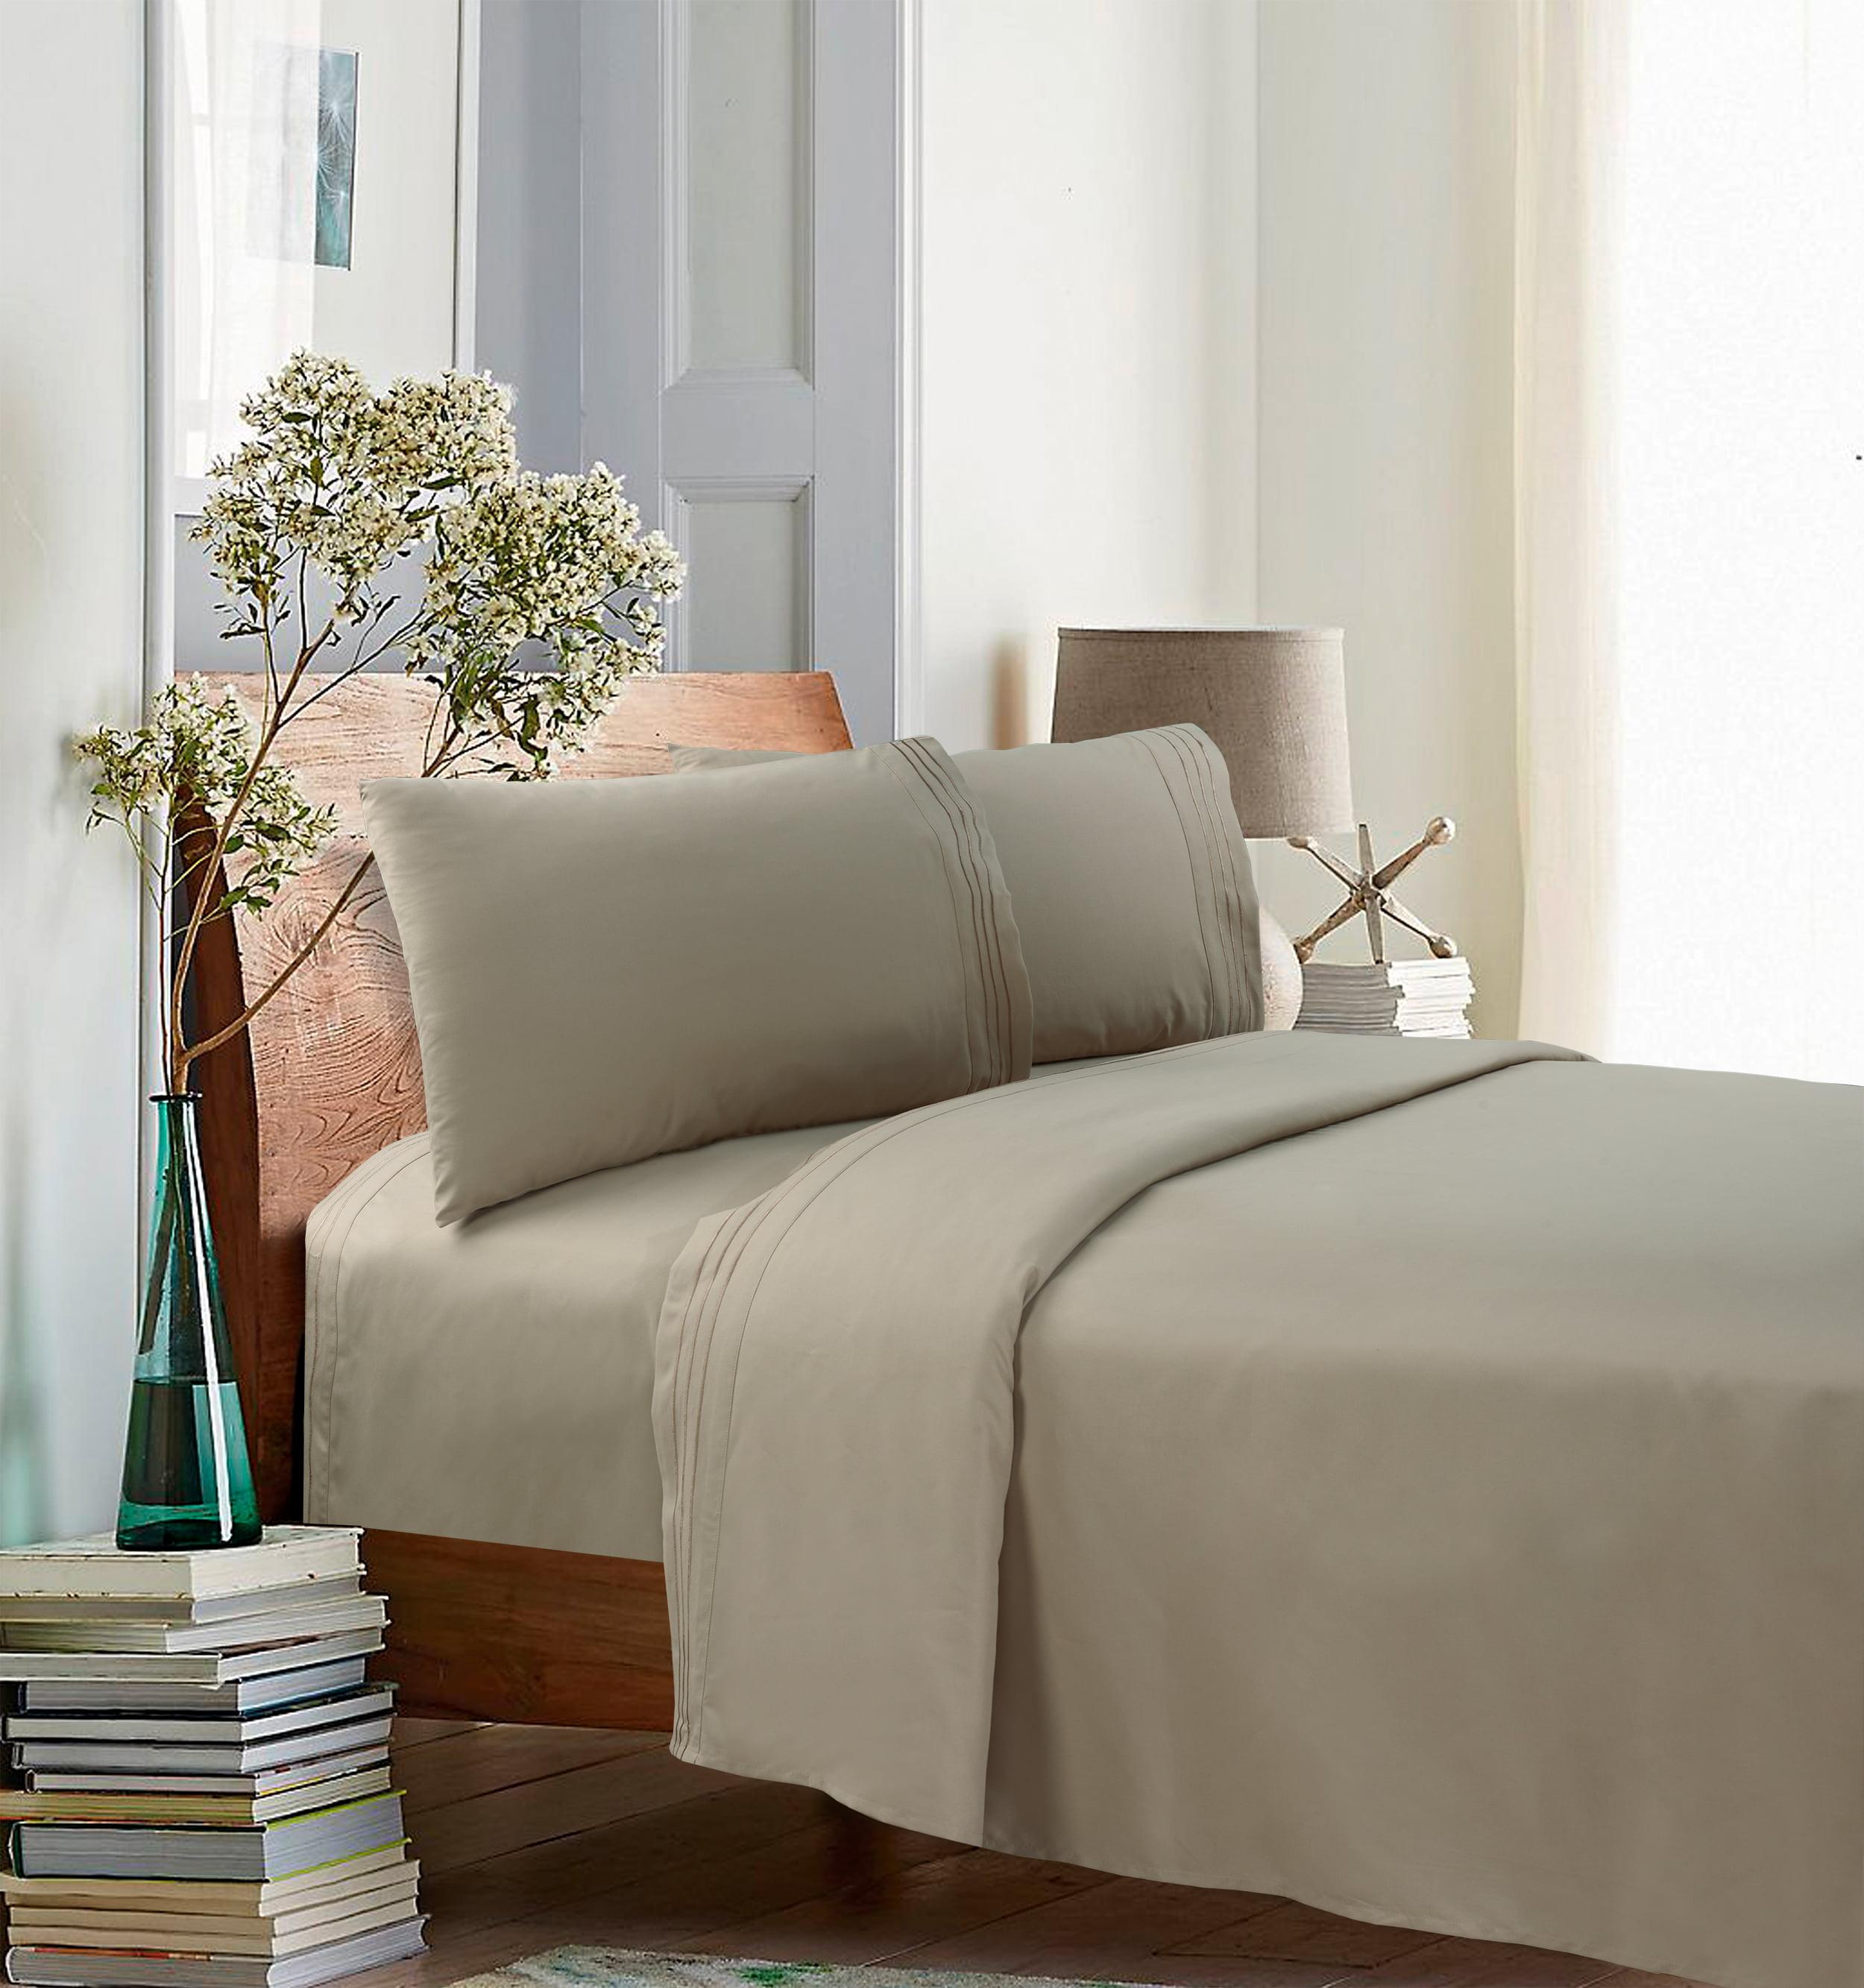 Mason Beige Sheet Ensemble Set Fitted Flat /& Pillow Cases Standard Hospital Bed